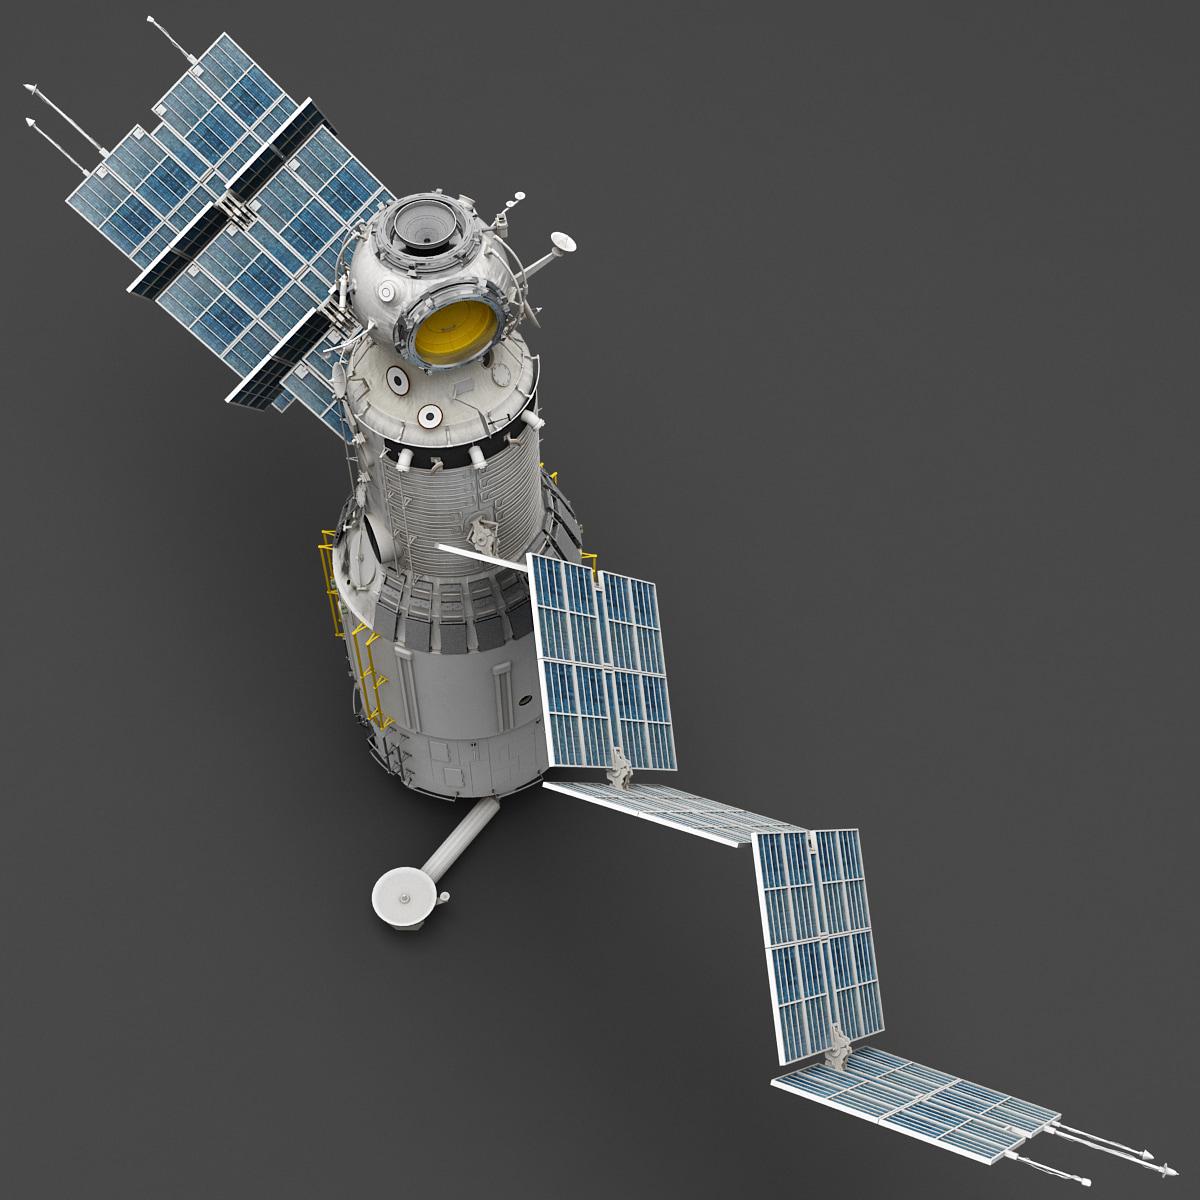 Space_Service_Module_Zvezda_Rigged_0001.jpg